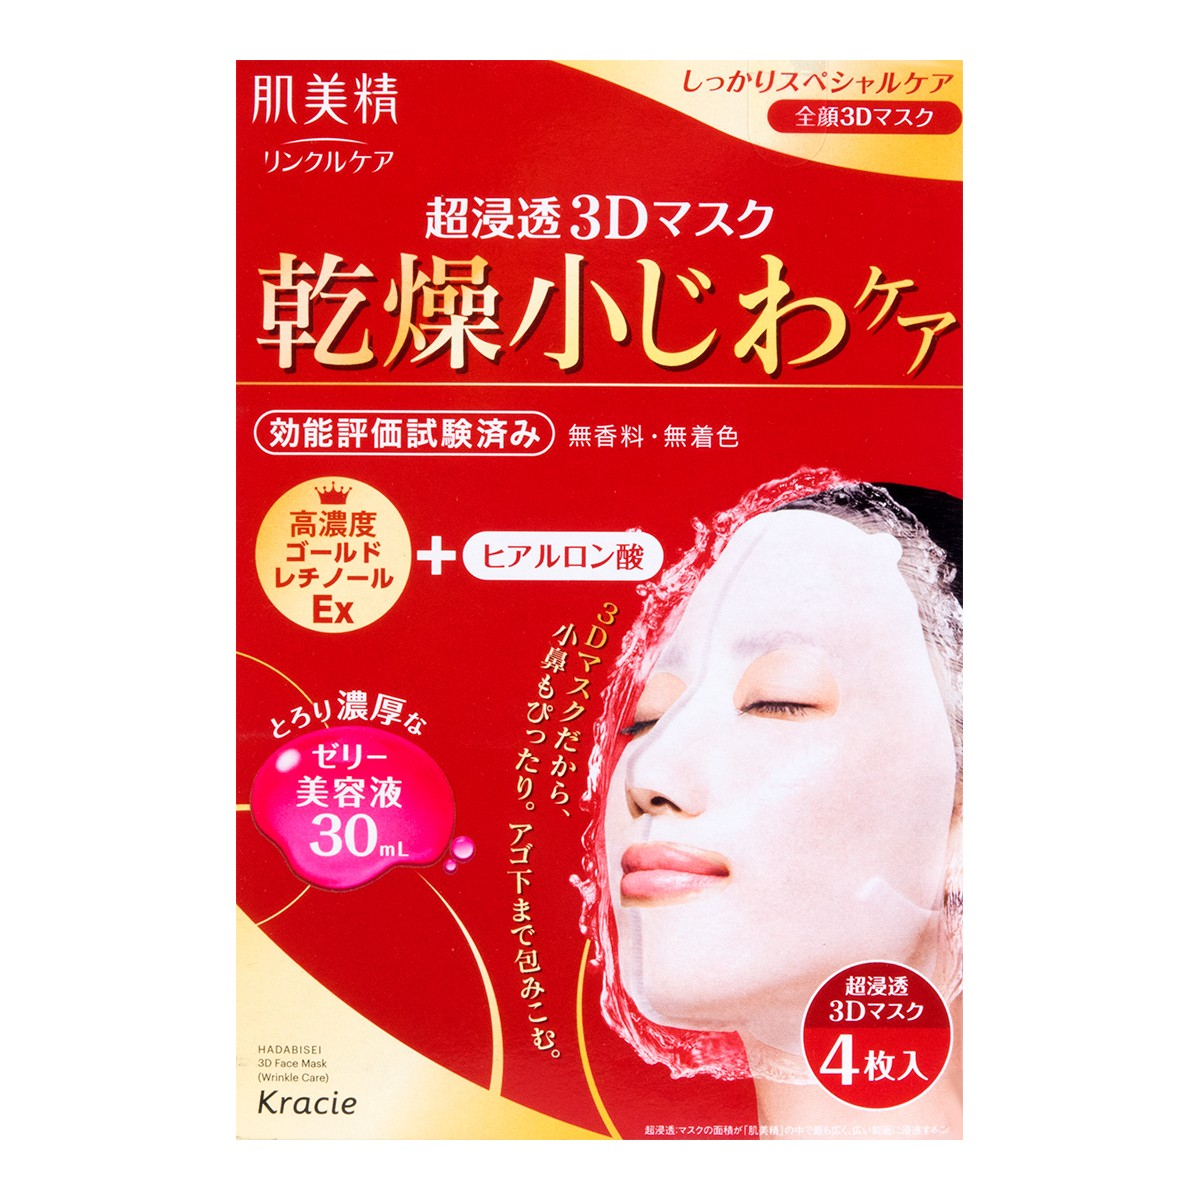 KRACIE HADABISEI Advanced Penetrating 3D Face Mask Aging-care Moisturizing 4sheets